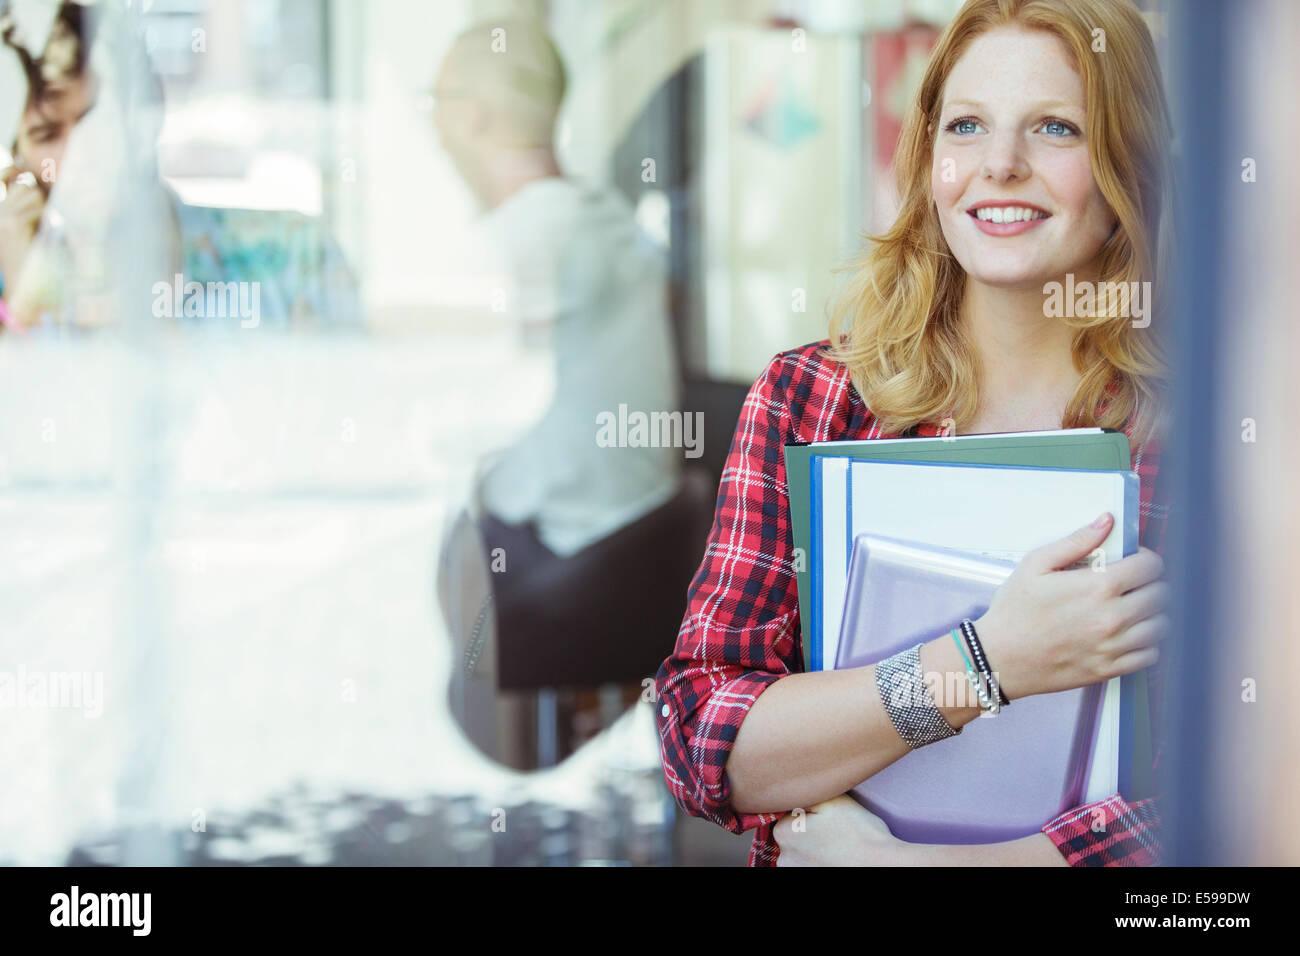 Frau mit Bindemittel im freien Stockbild